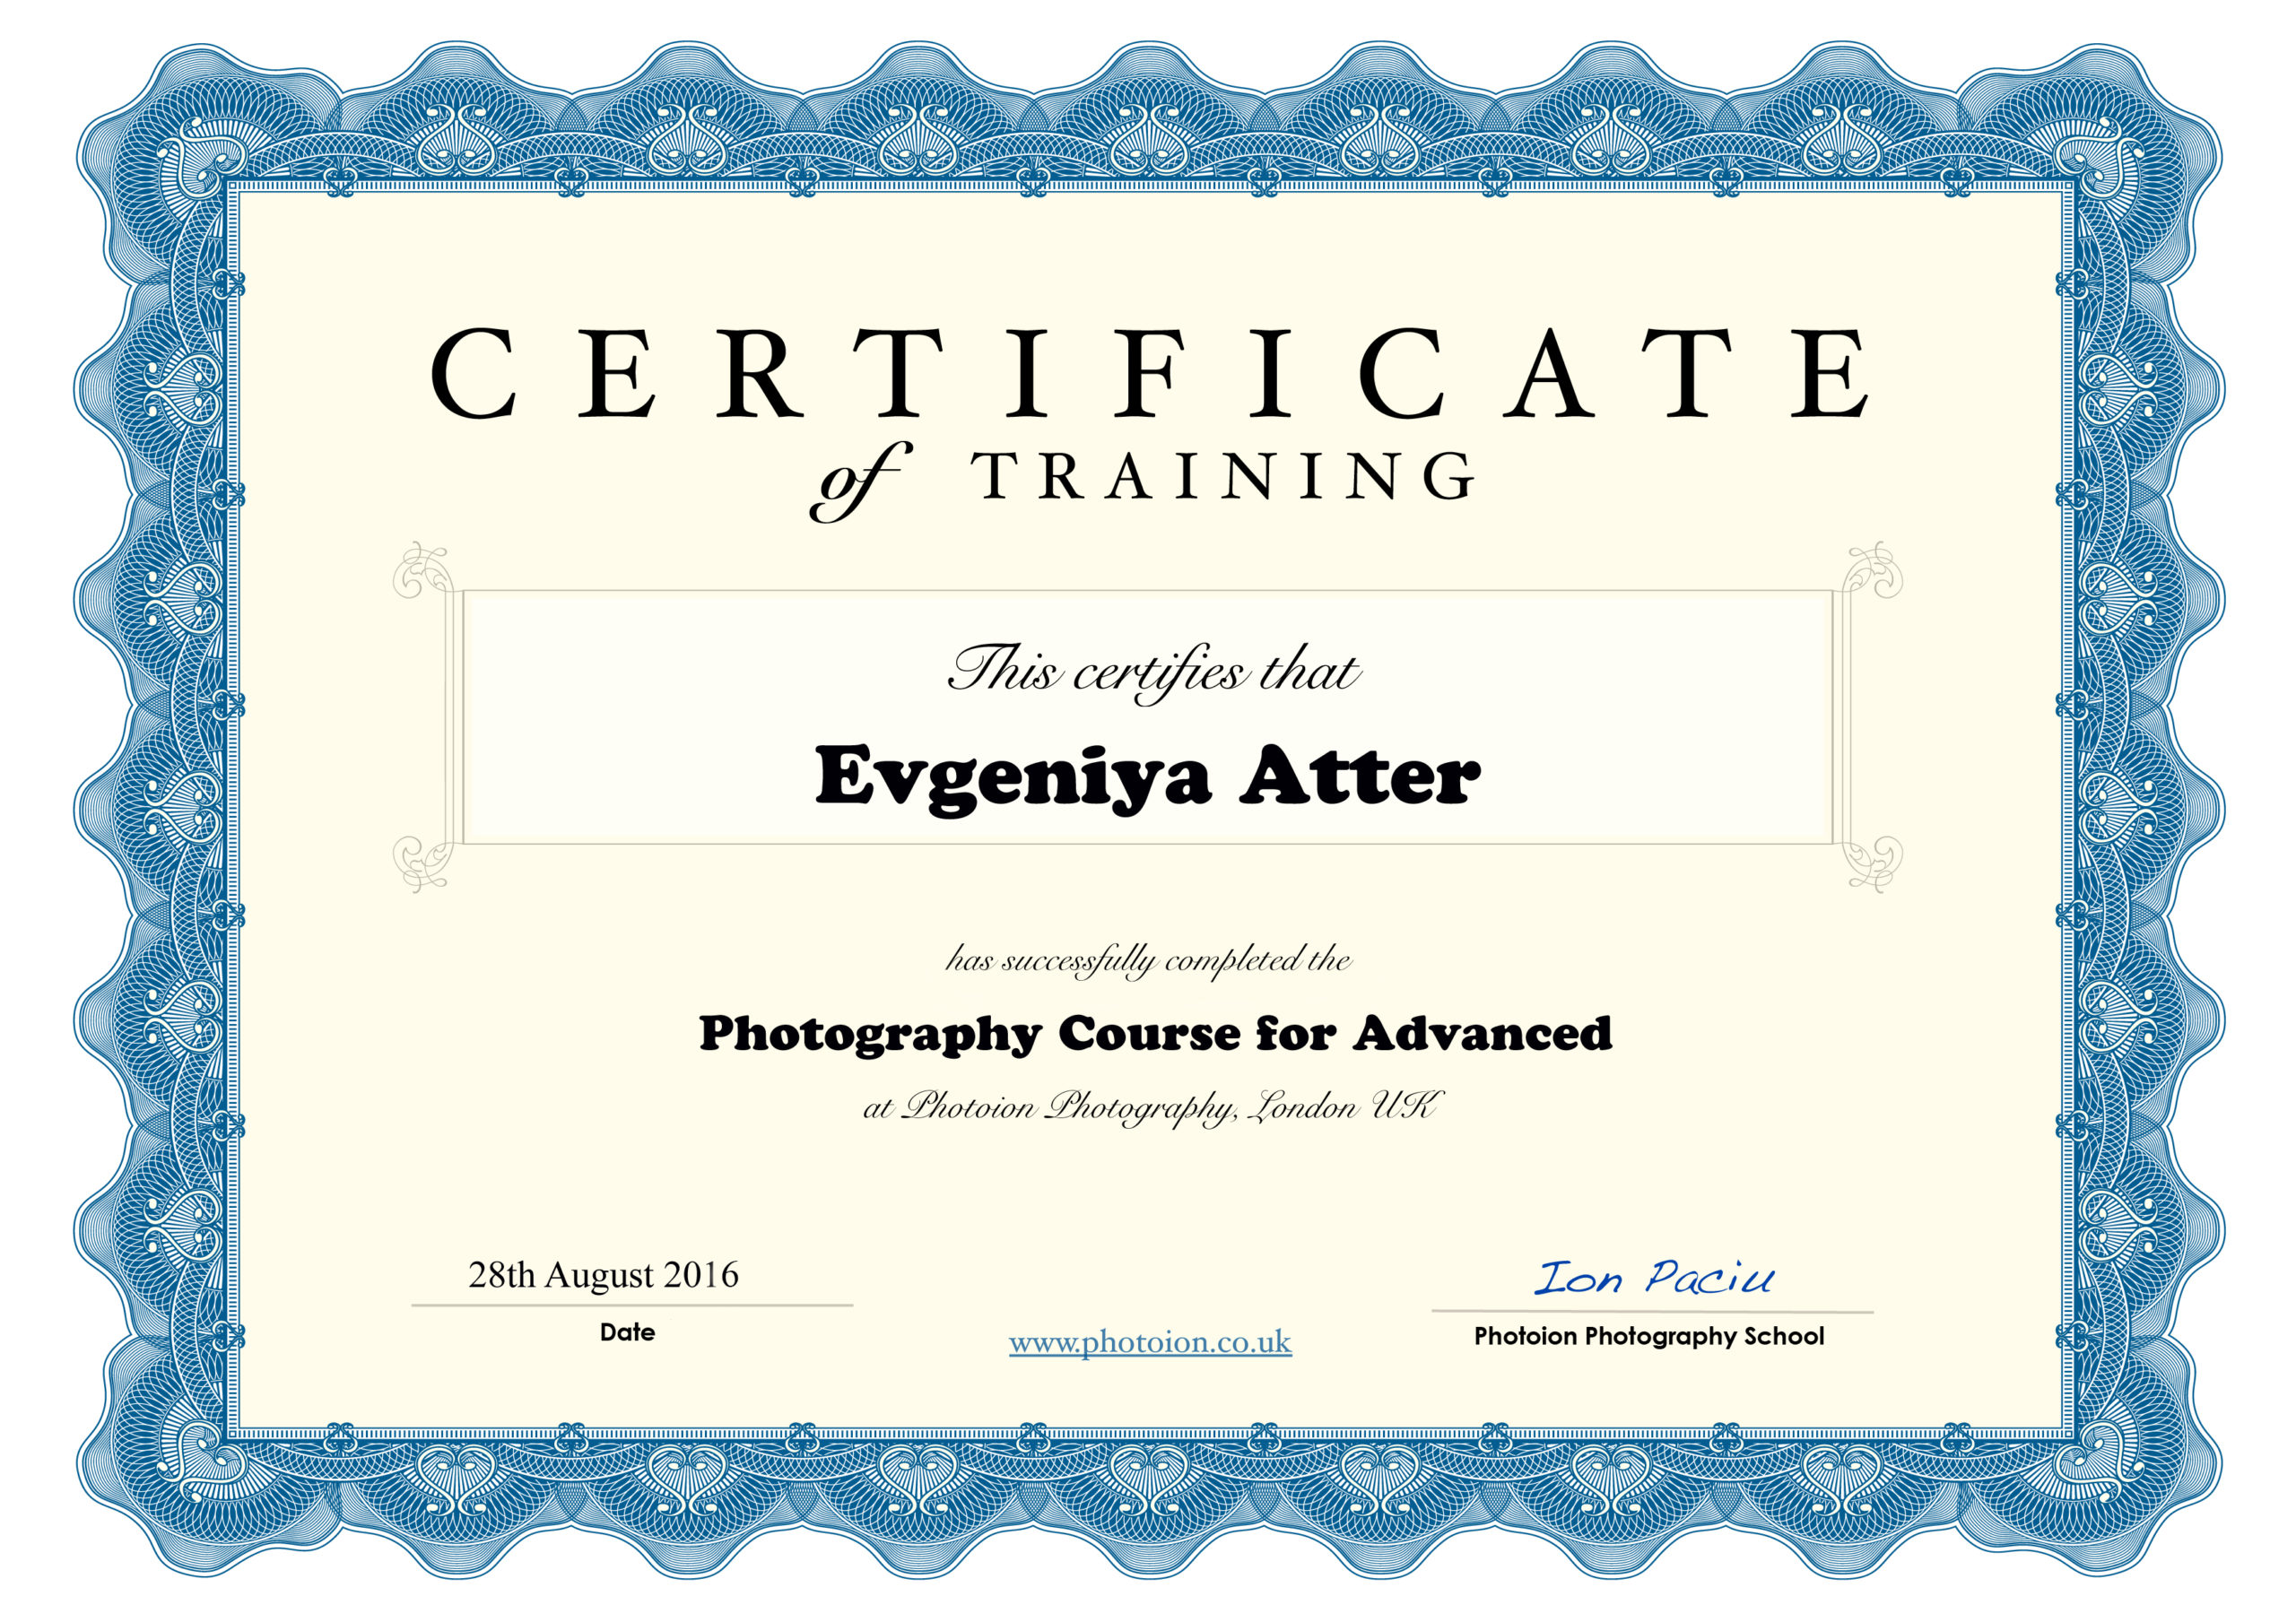 Photography education certificate accreditation in photography Family Photographer Newborn Photographer Studio lighting